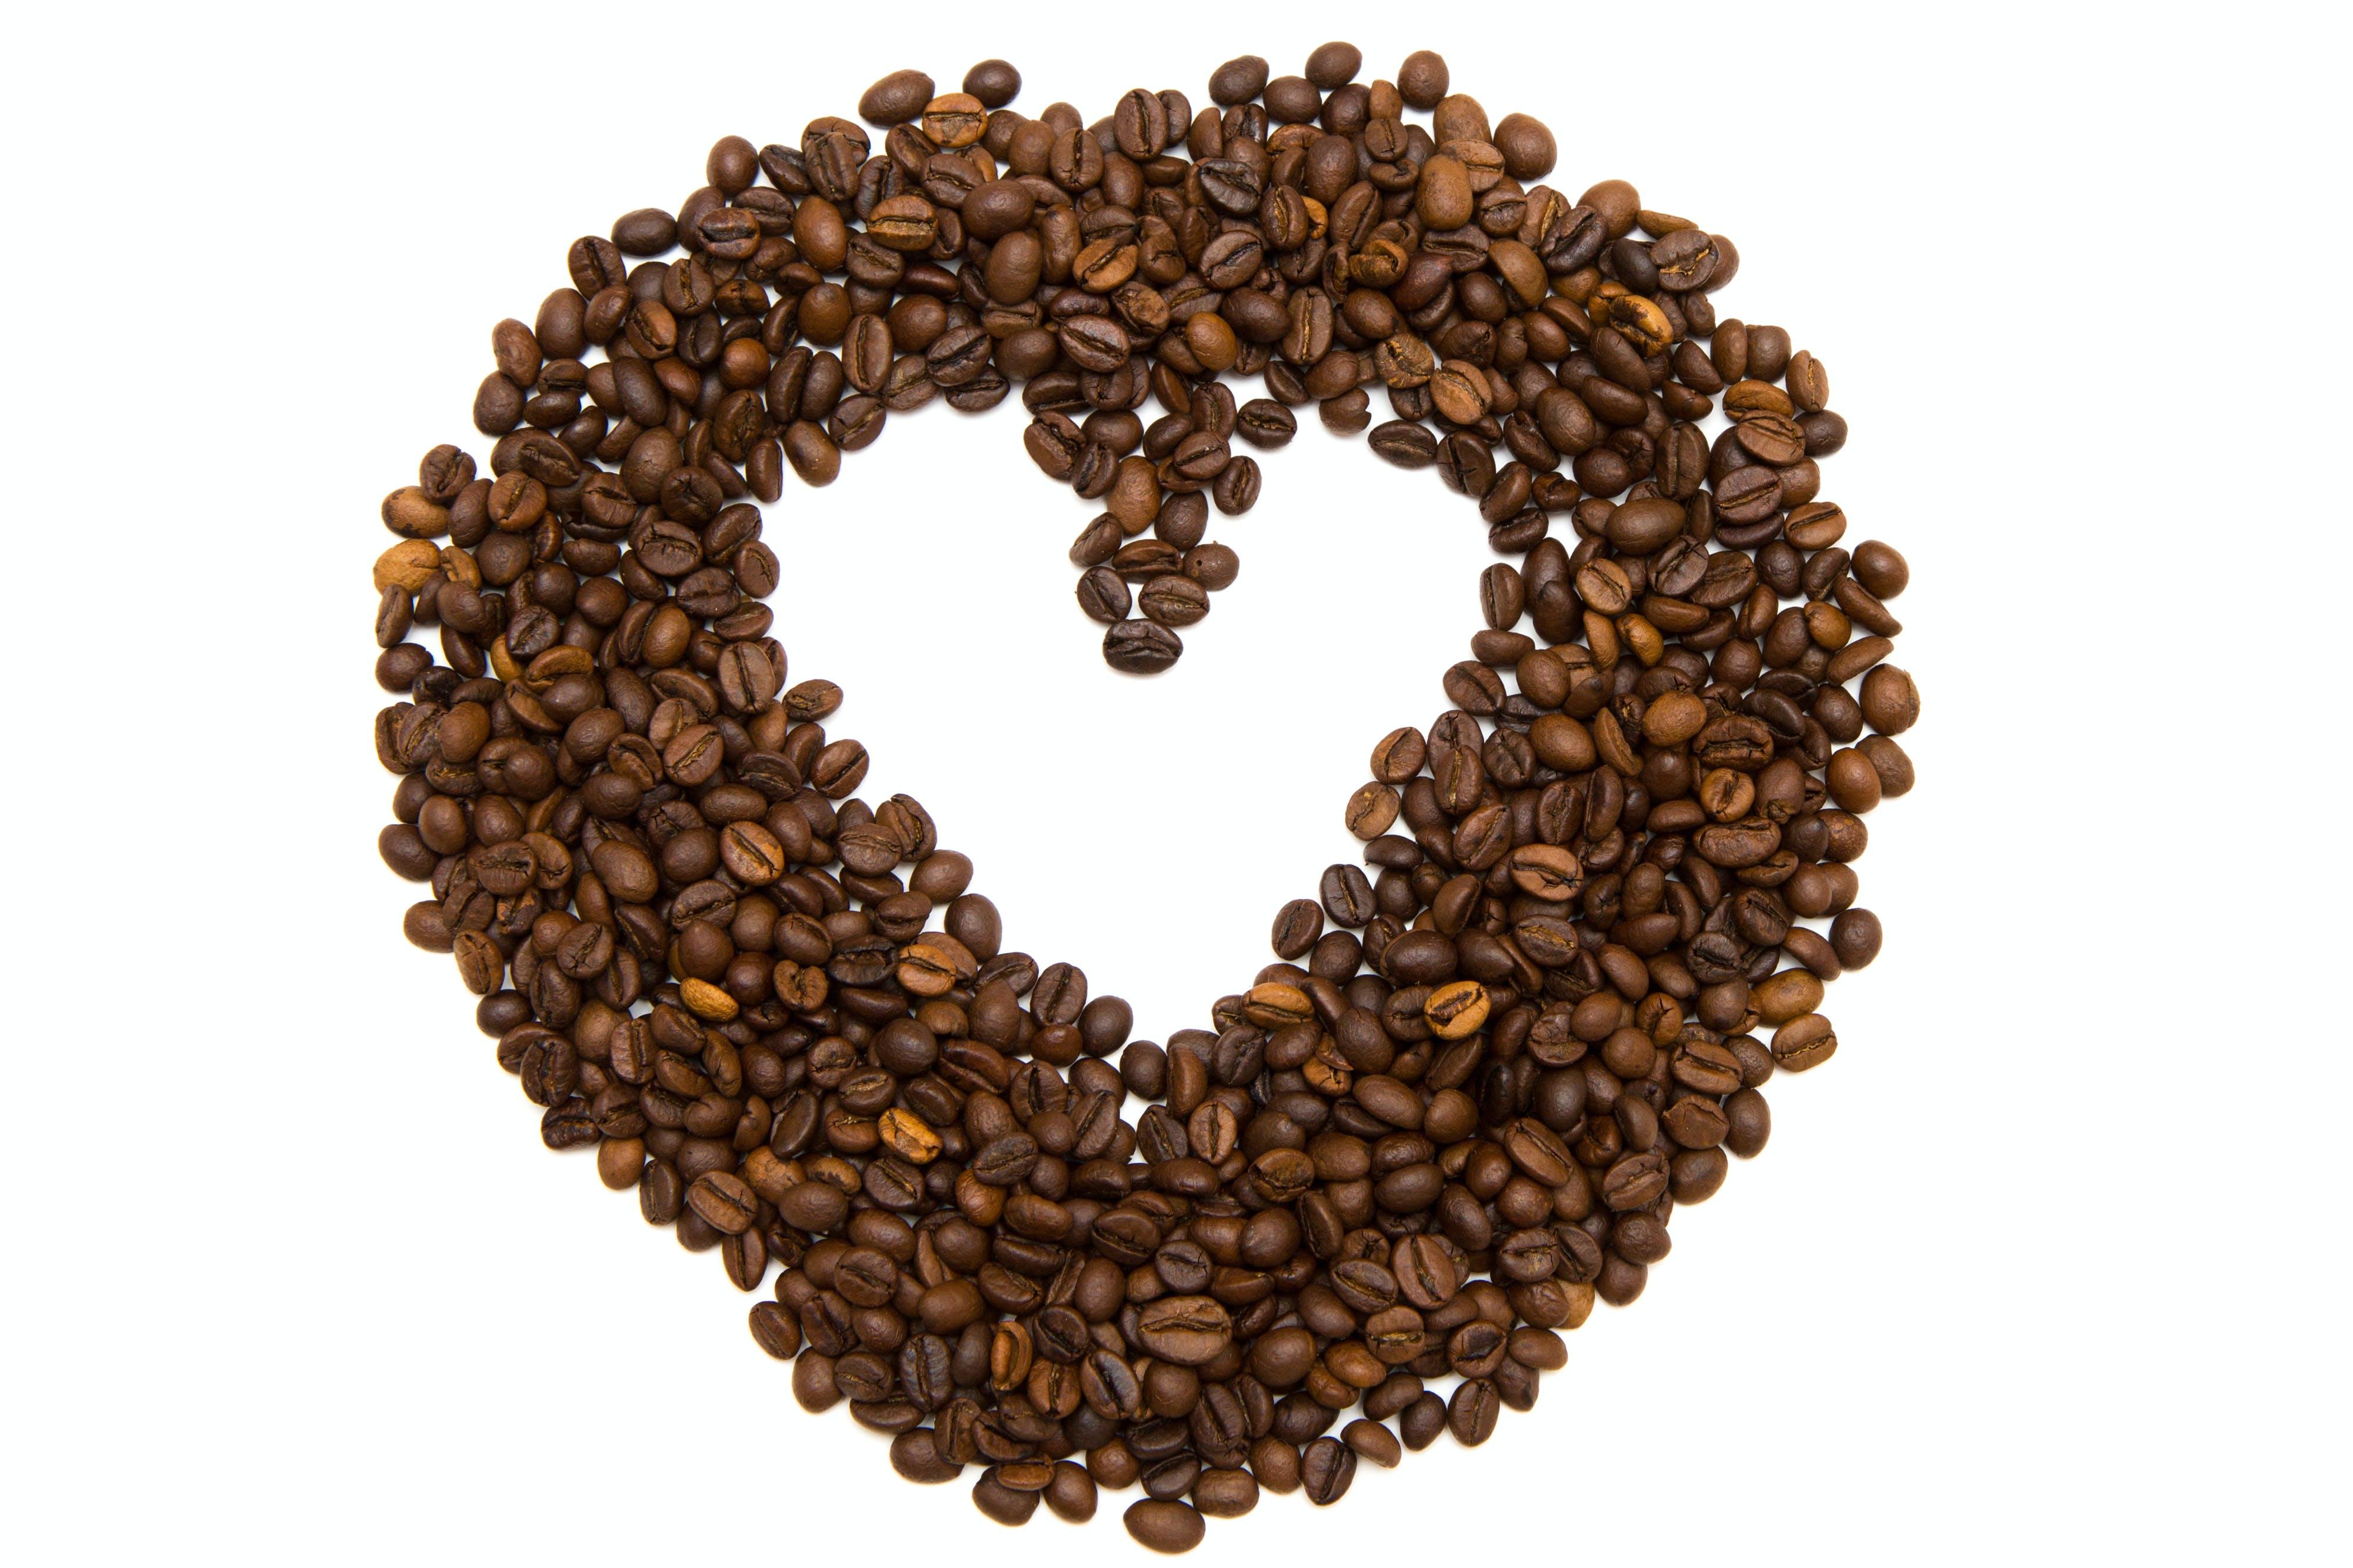 Coffee Bean Formed Heart